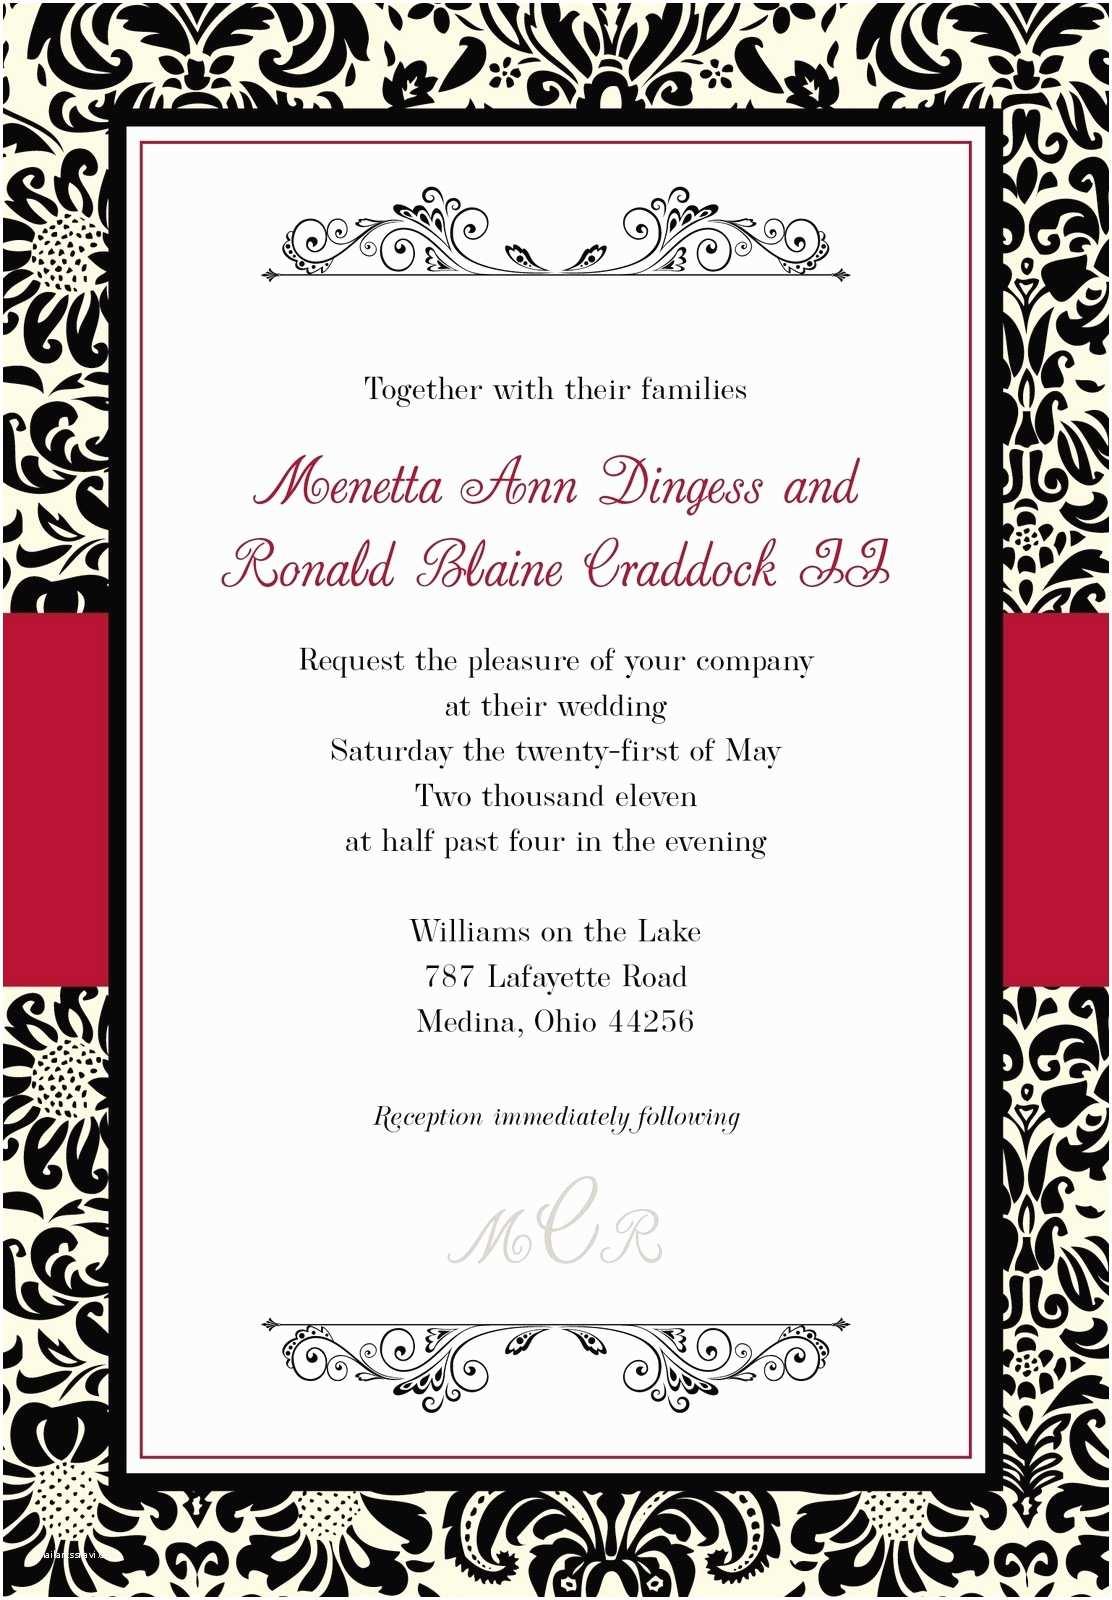 Target Wedding Invitations Bridal Shower Invitations Tar Template Resume Builder